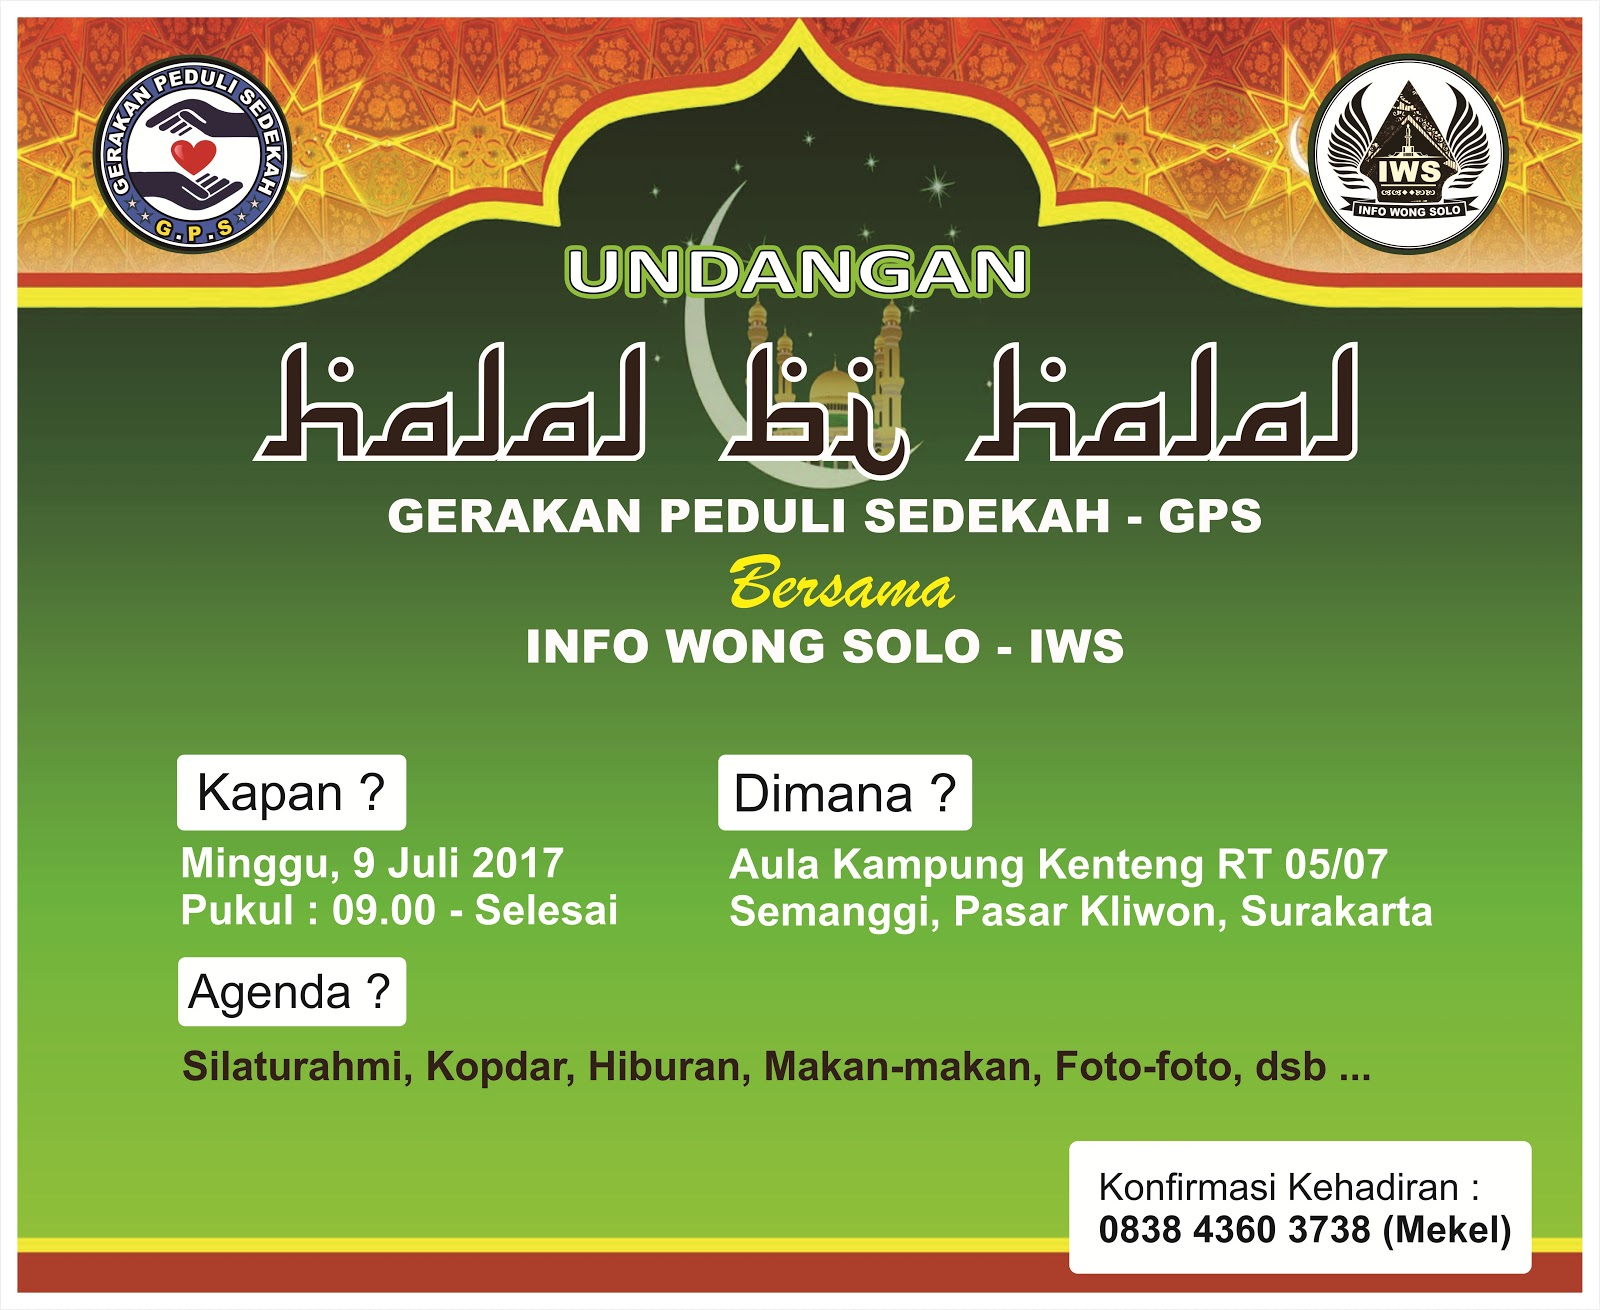 Halal Bihalal 1438h Gps Dan Iws Gerakan Peduli Sedekah